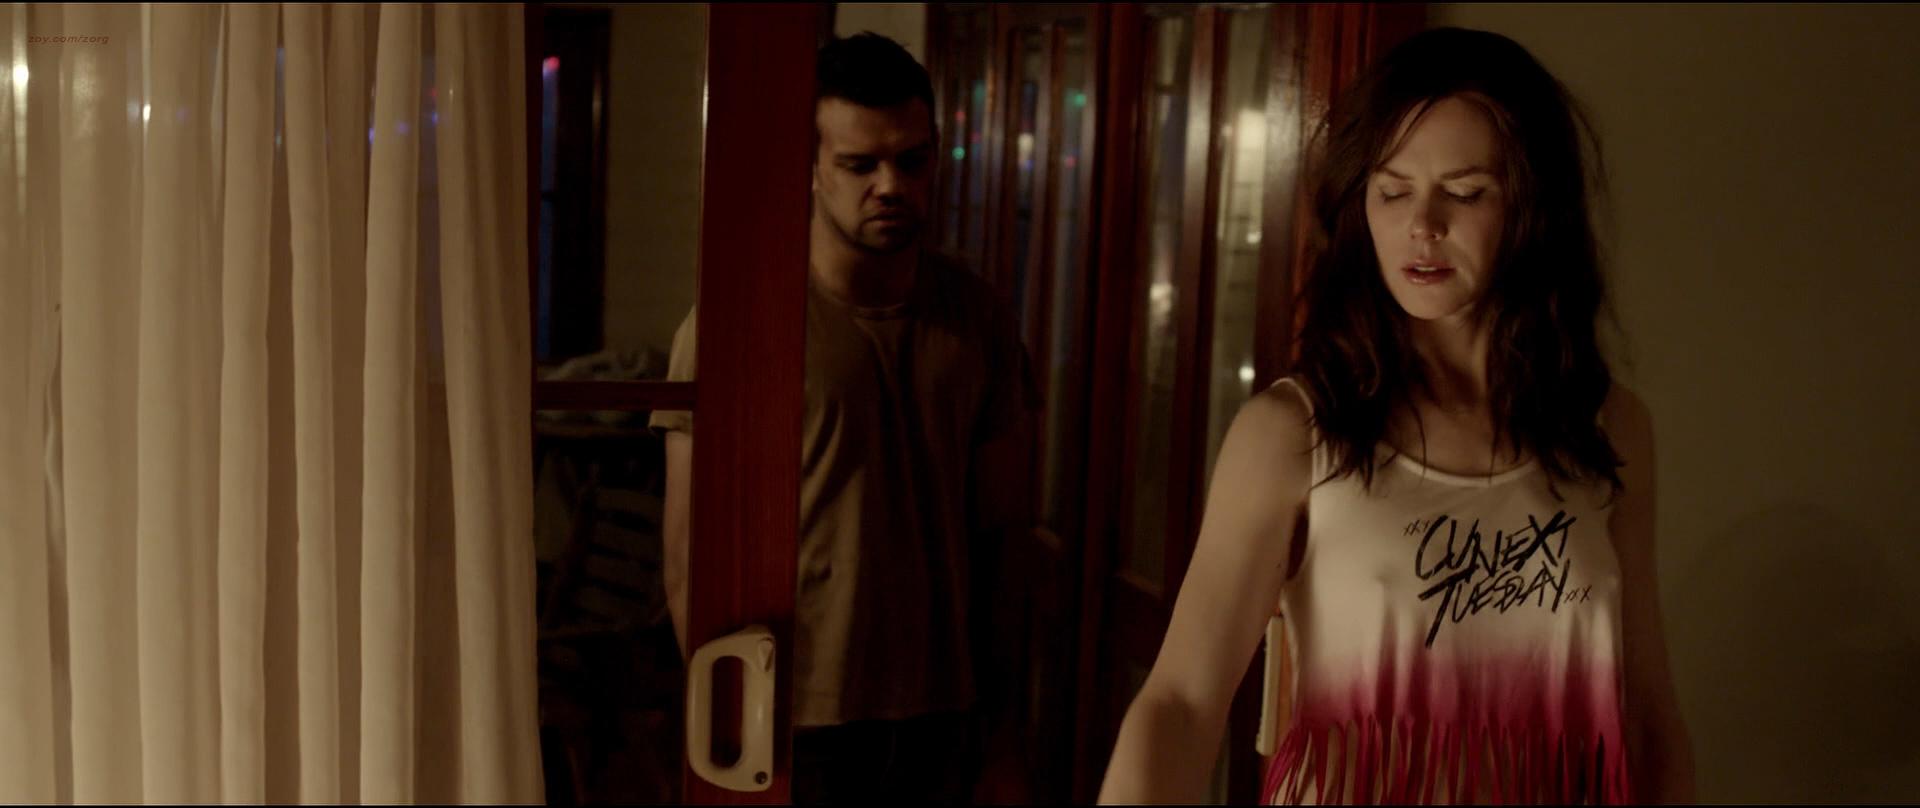 Nicole Kidman nude full frontal or bd and Madisson Brown hot - Strangerland (2015) hd1080p BluRay (5)